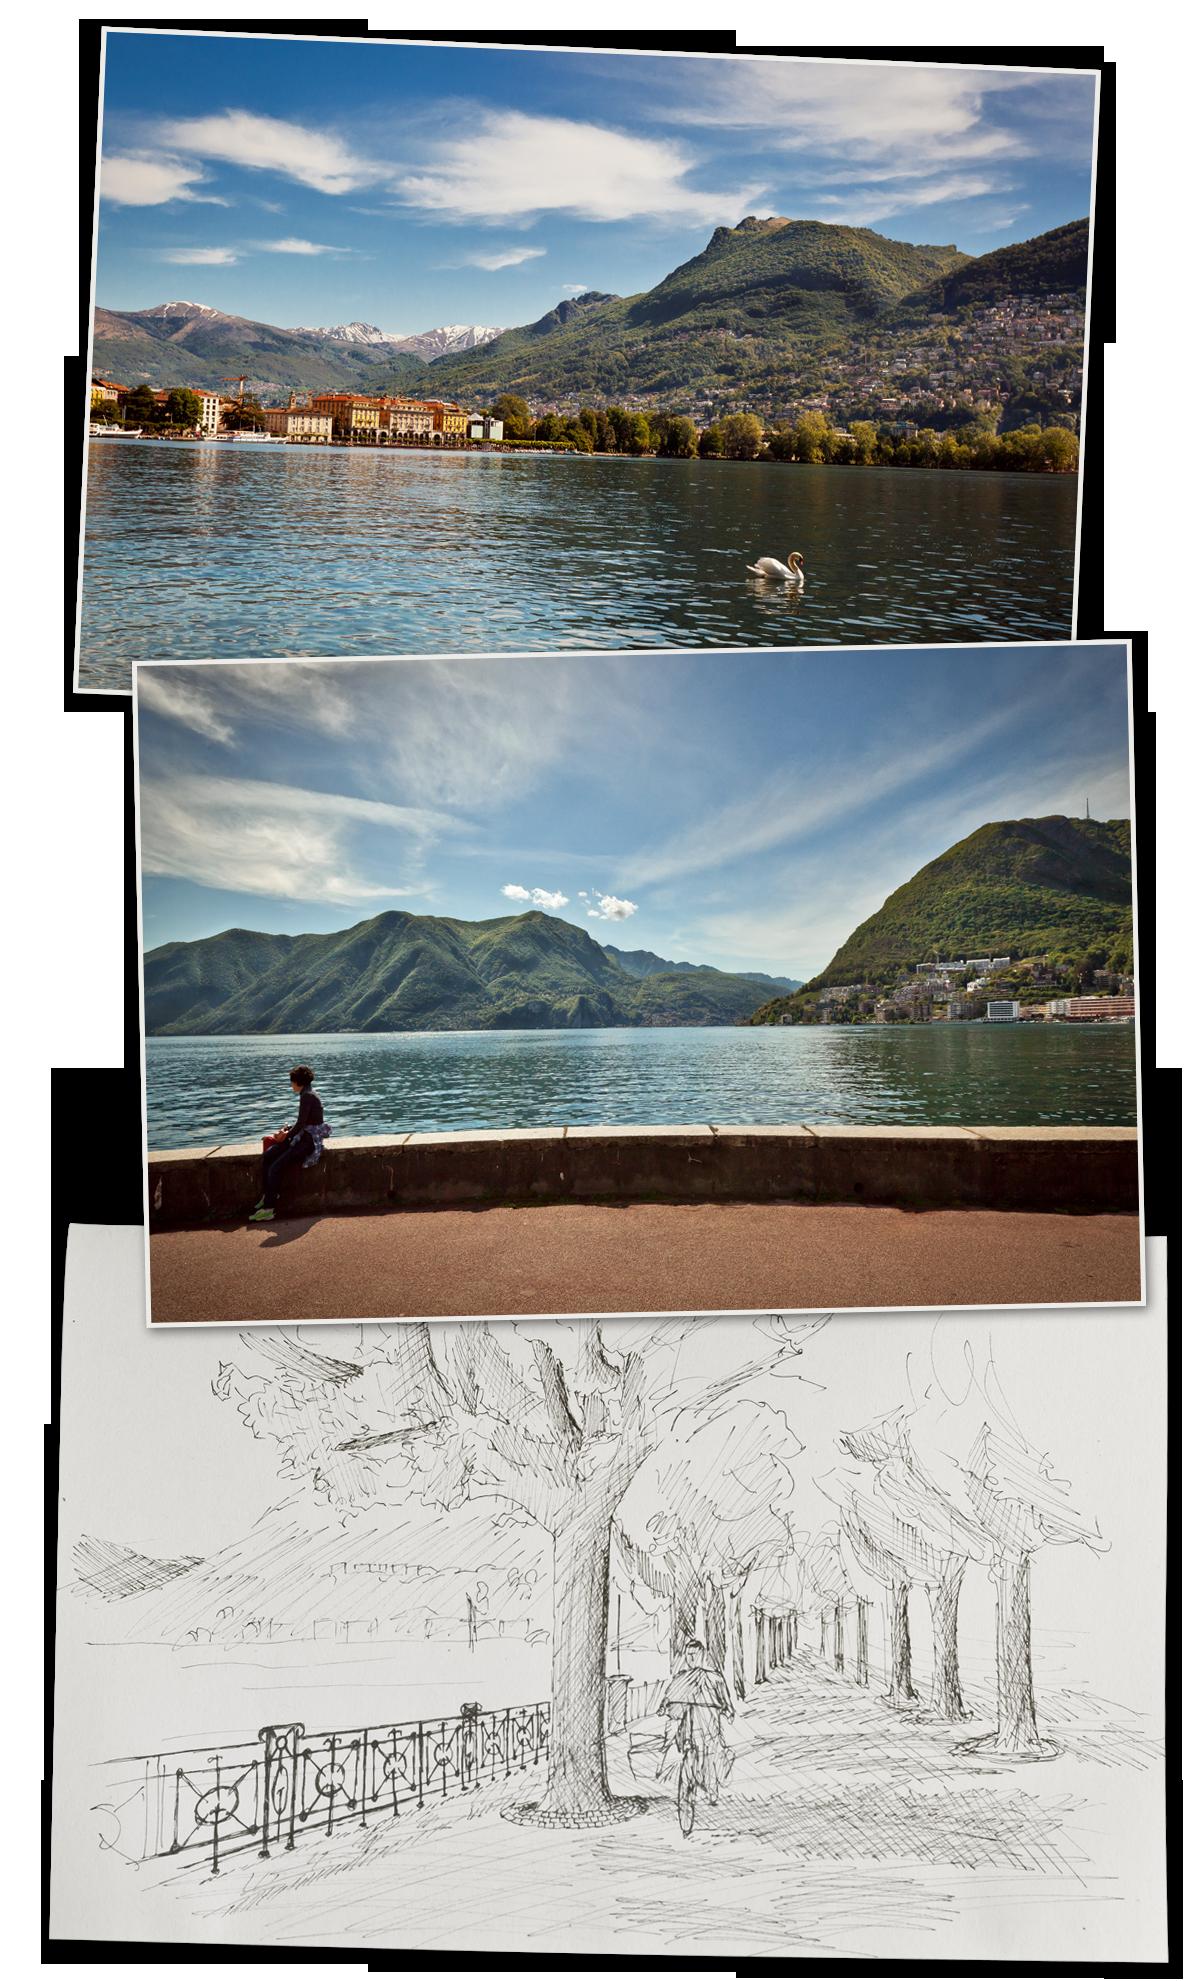 Lugano, promenade au bord du lac